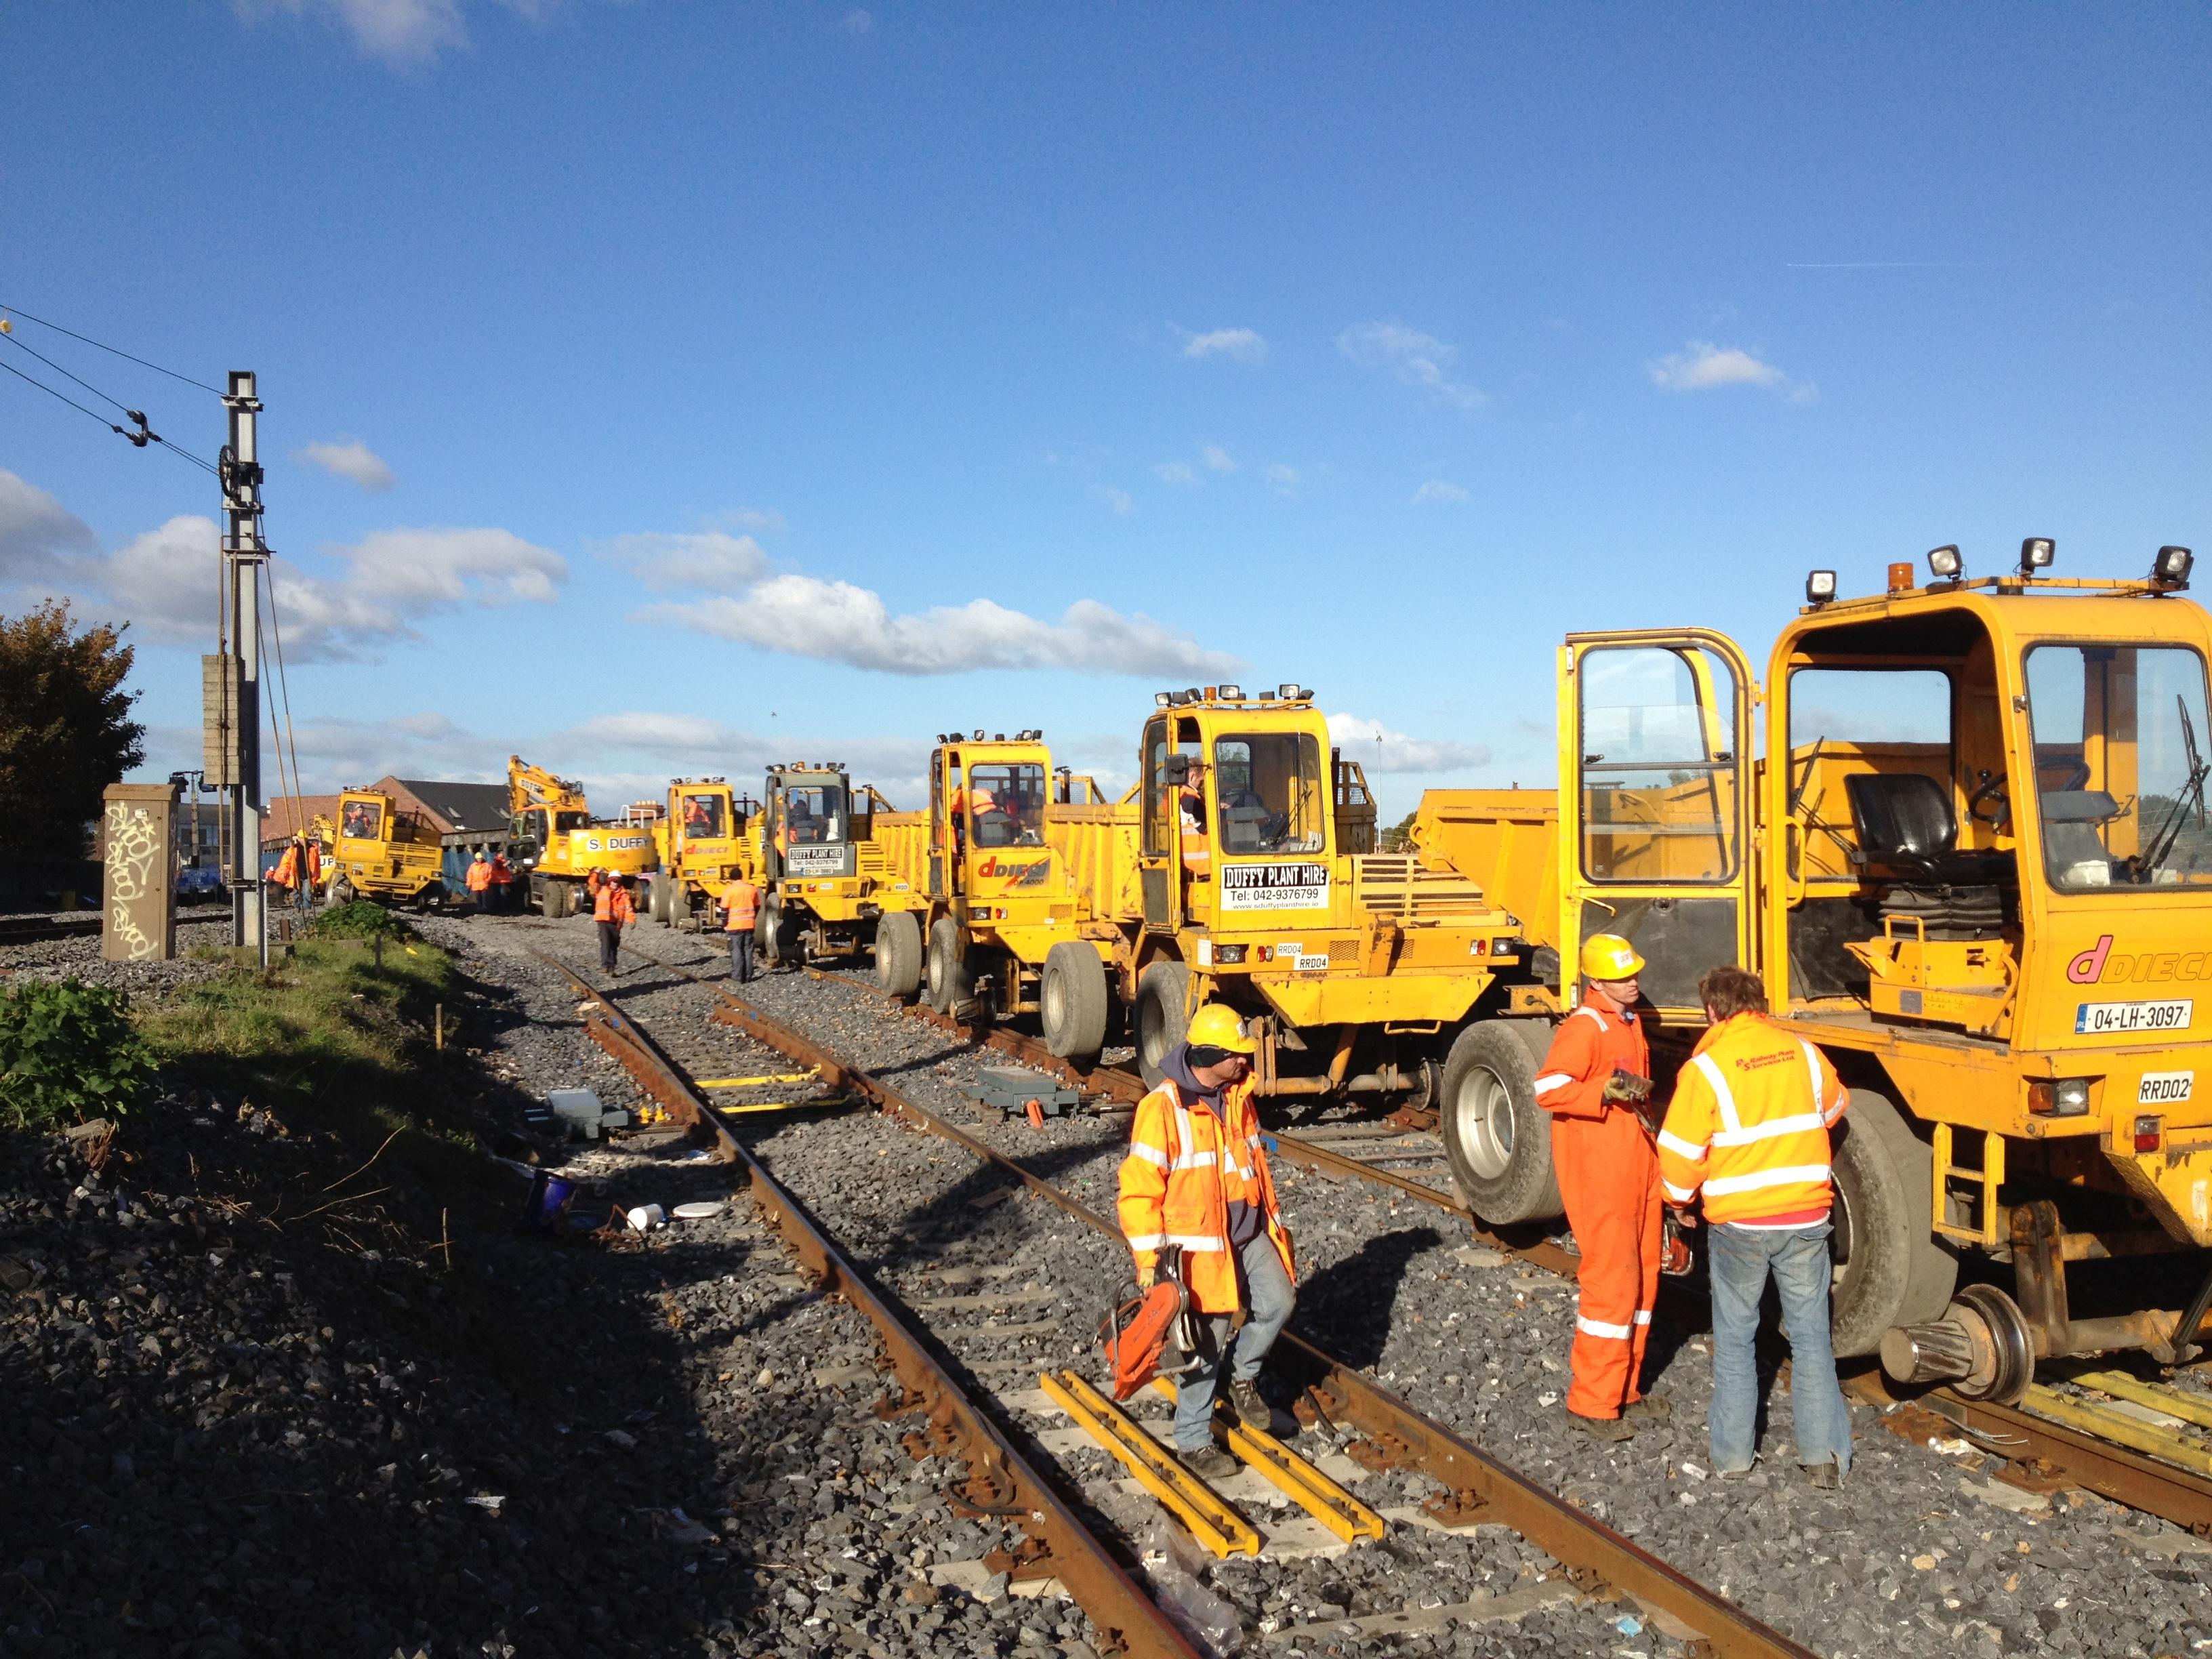 S Duffy Plant Hire Deici Rail Road Dumpers